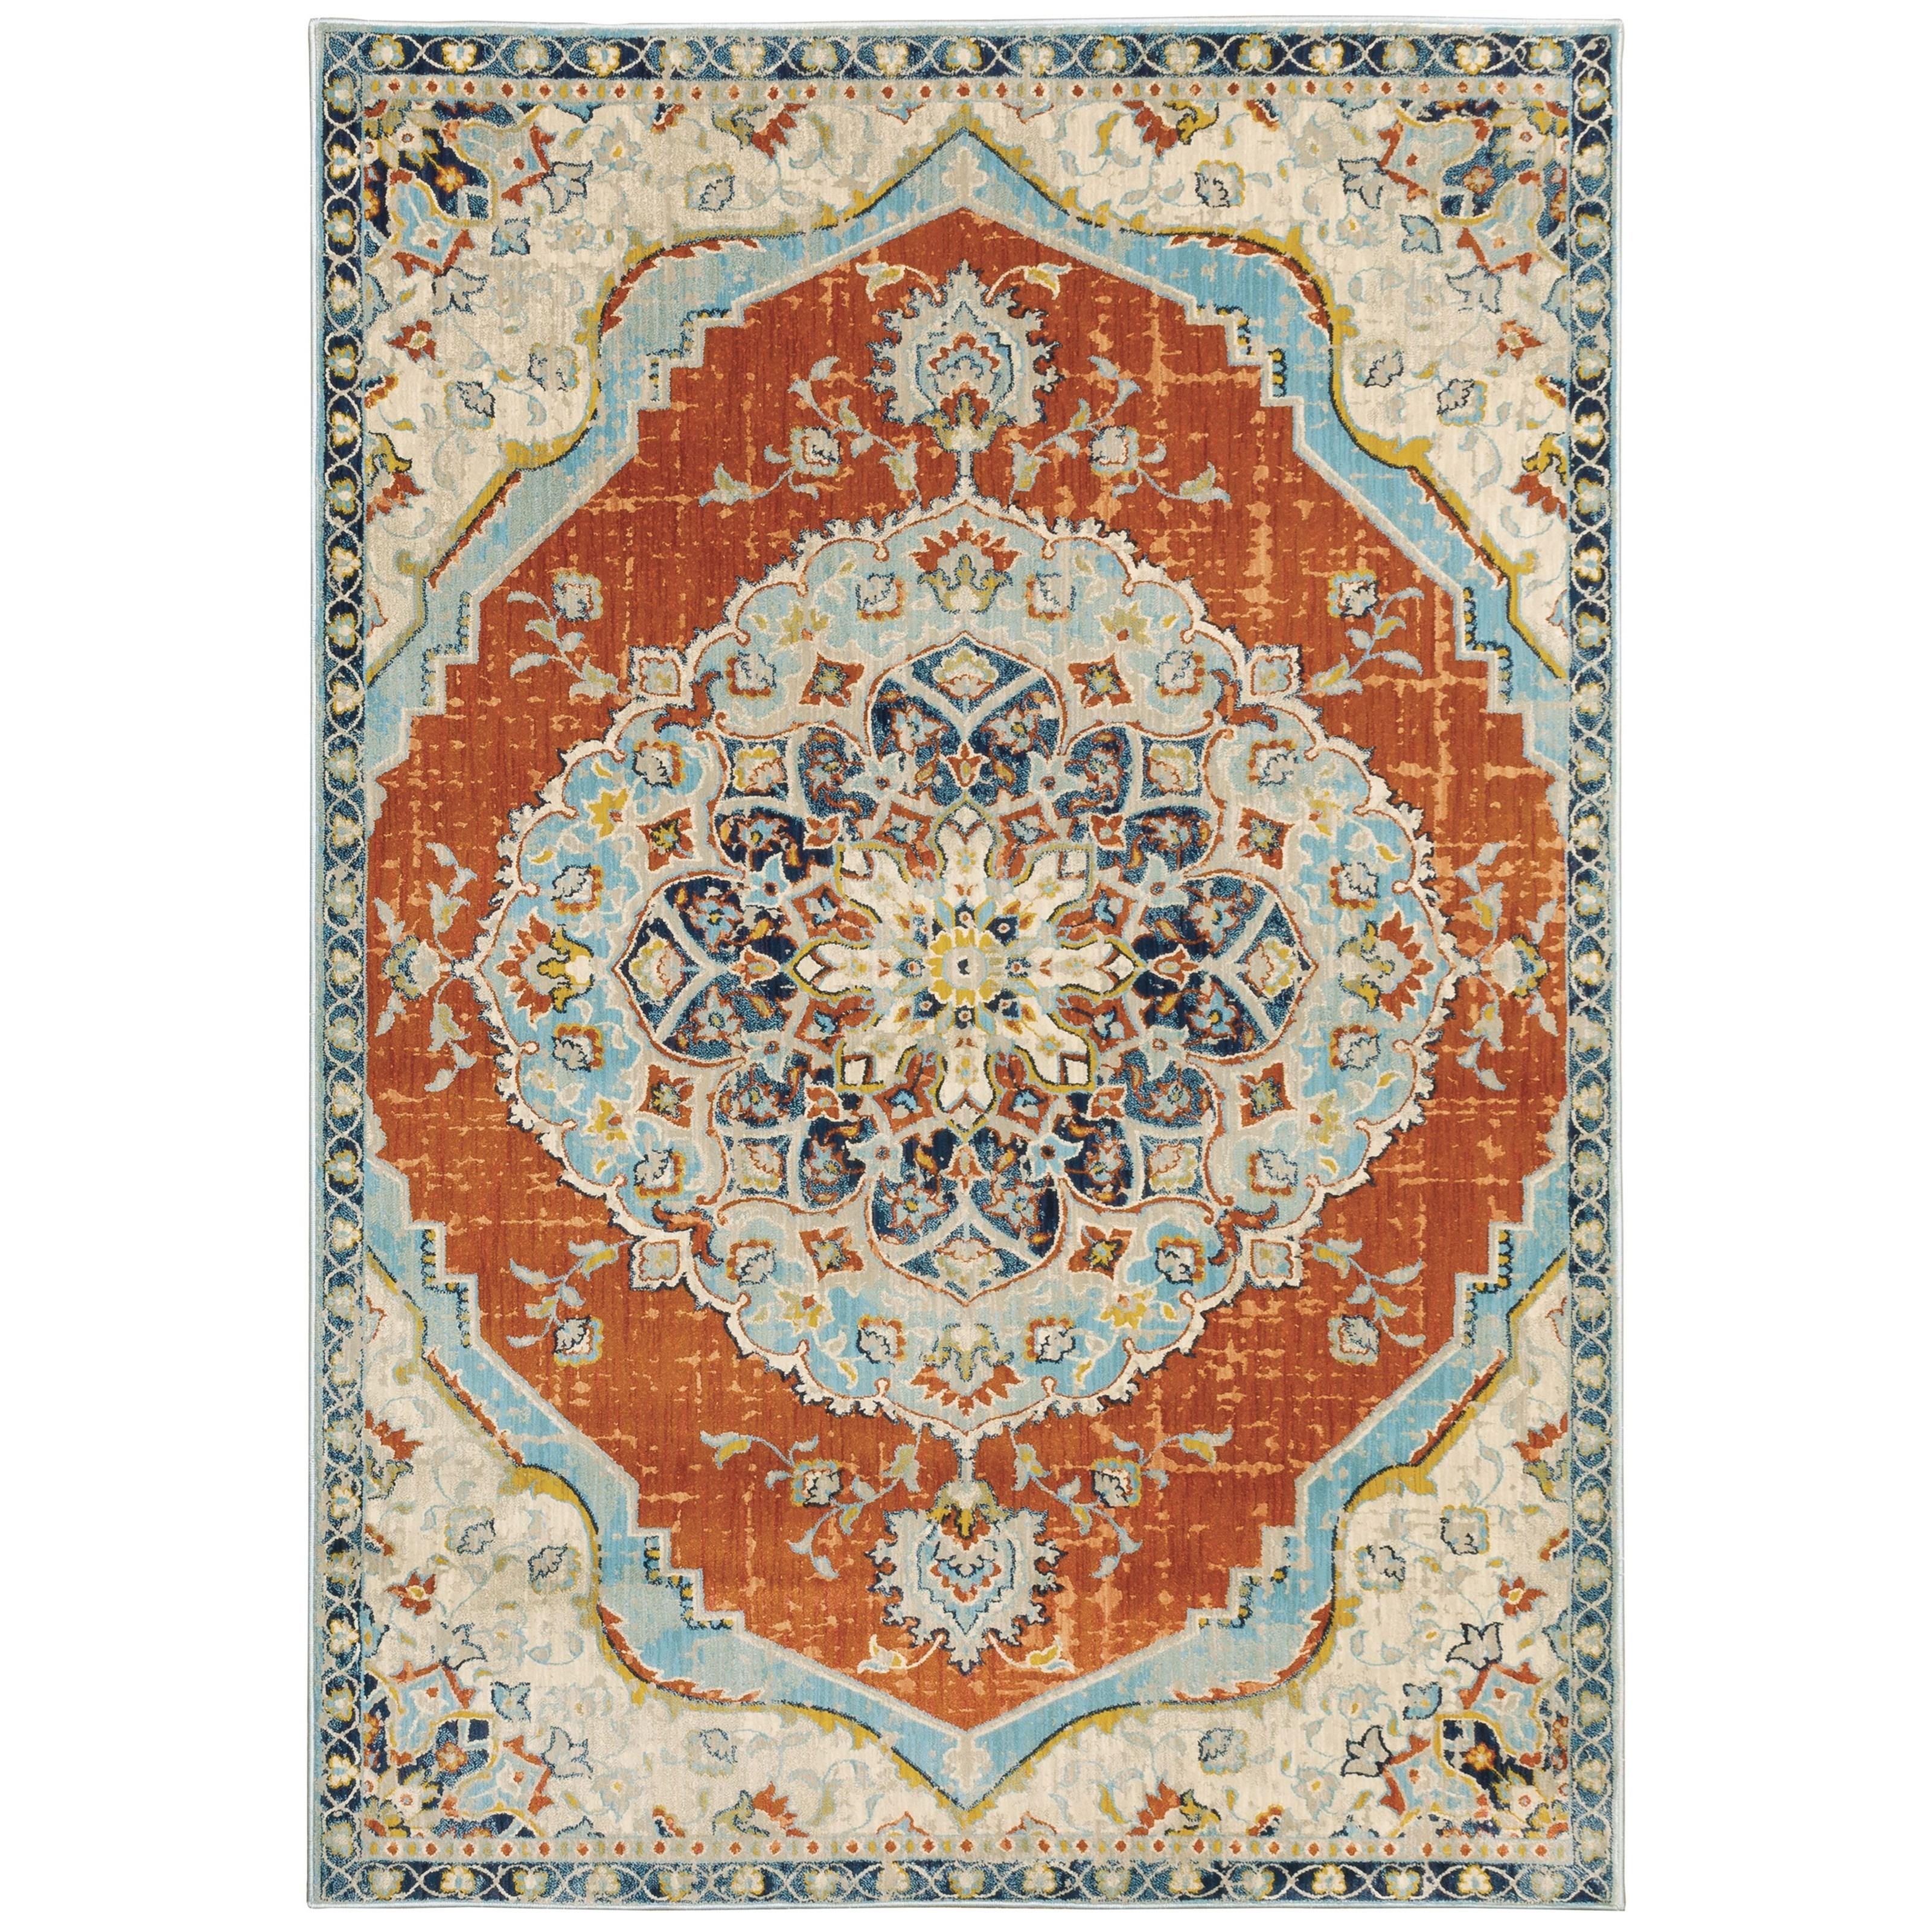 "Xanadu 9'10"" X 12'10"" Rectangle Rug by Oriental Weavers at Novello Home Furnishings"